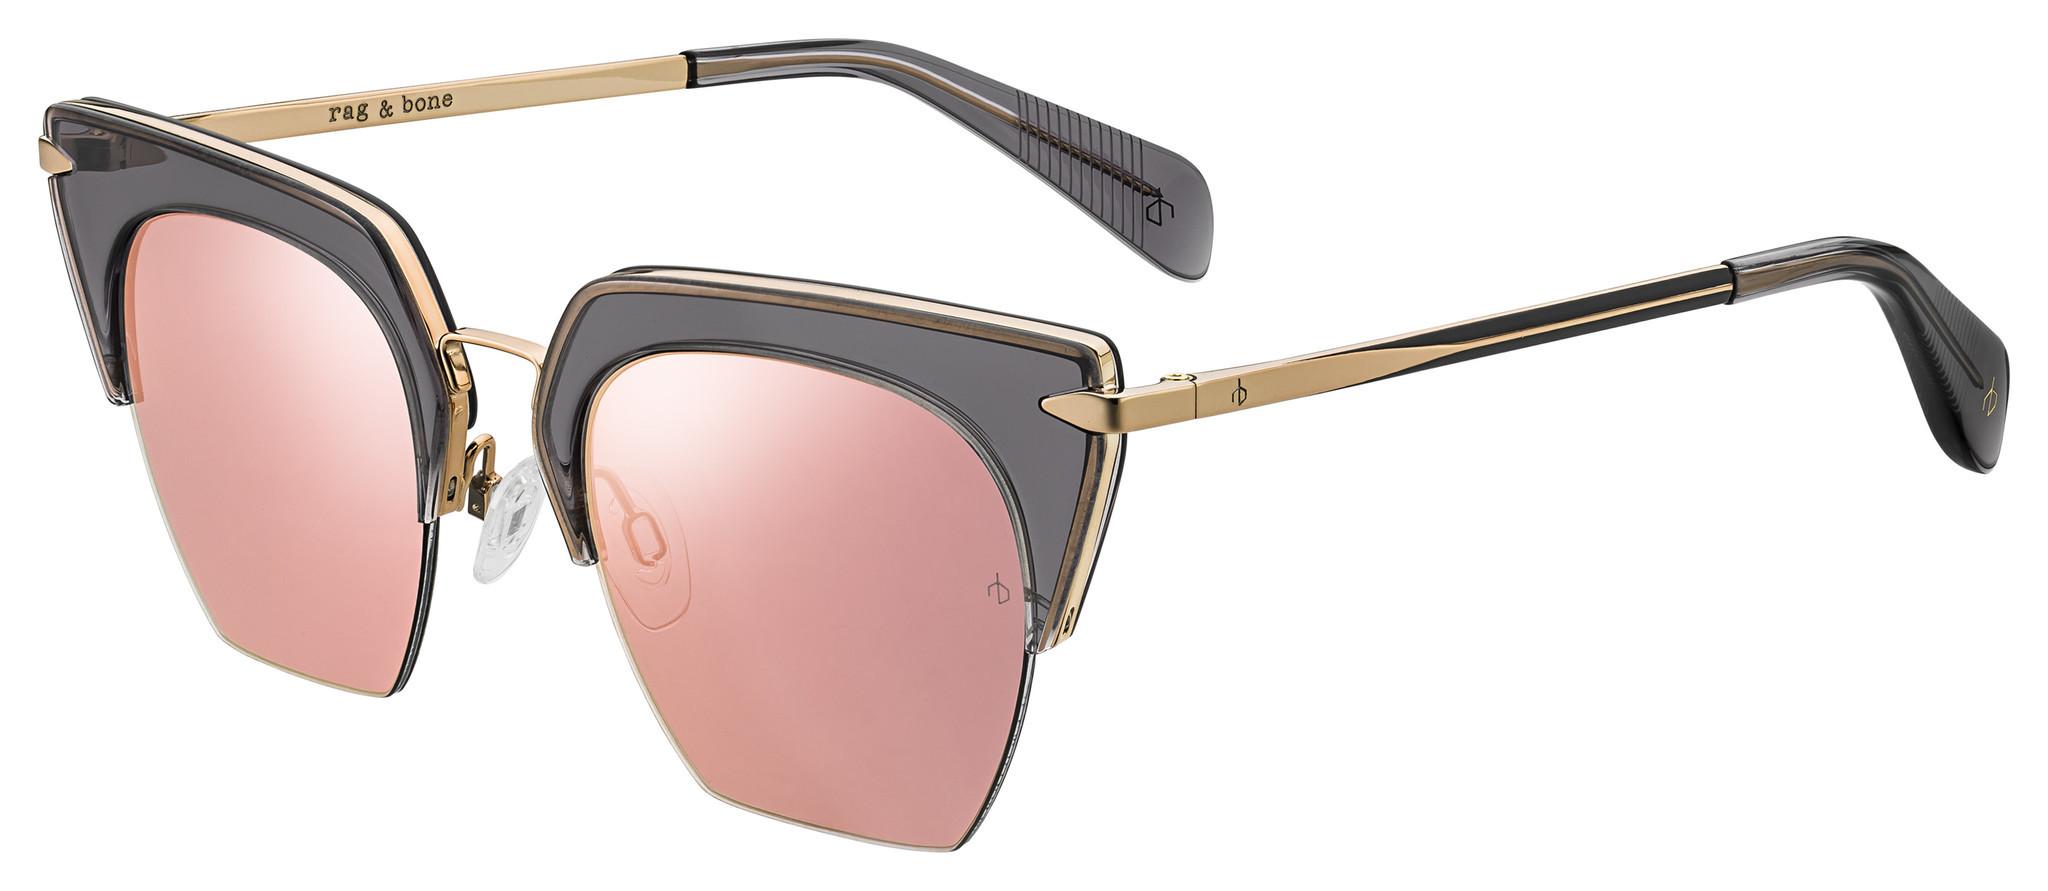 Rag & Bone Del Rey sunglasses.